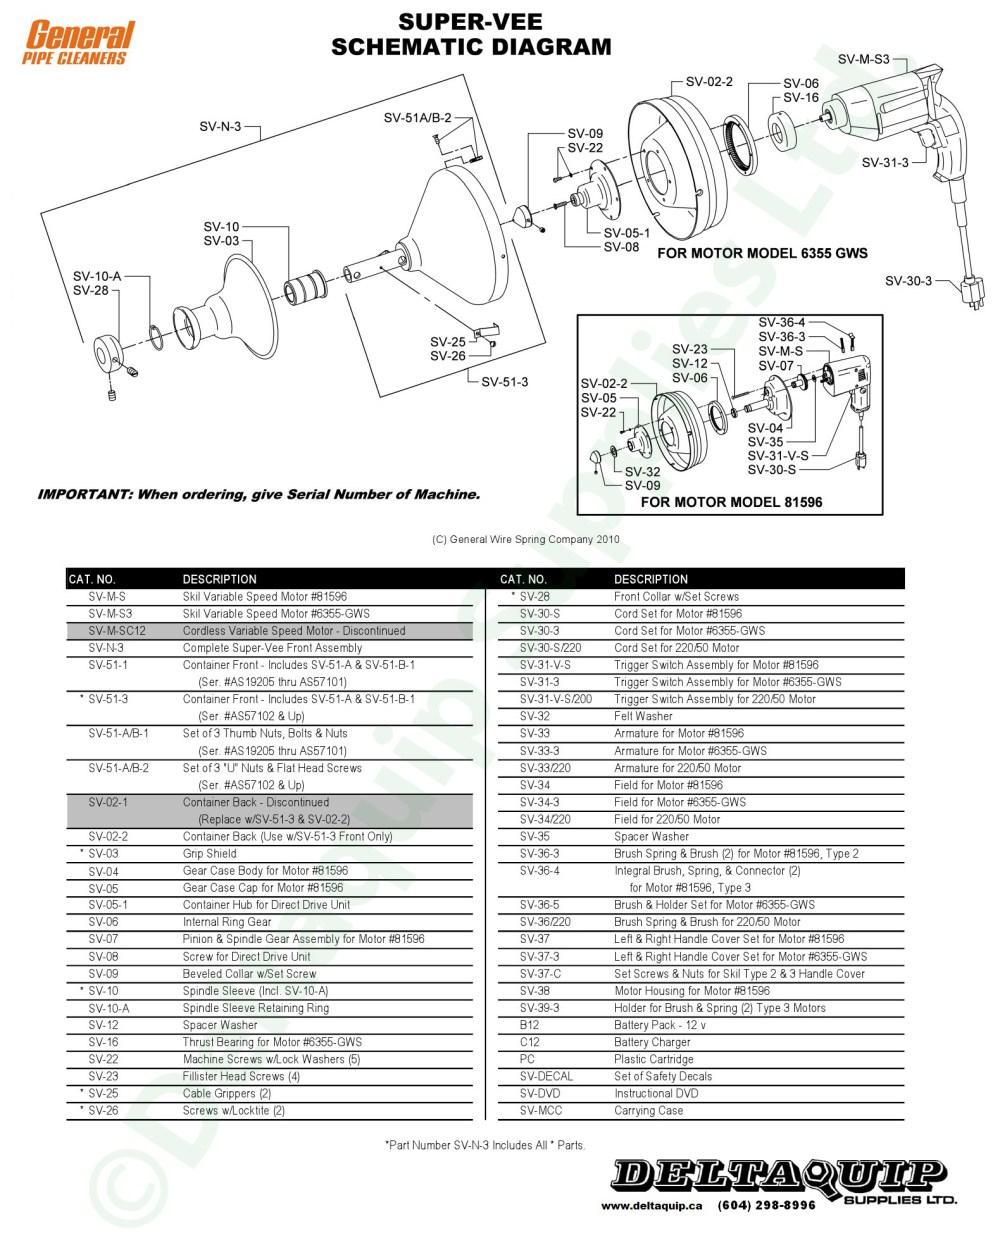 medium resolution of general super vee wiring diagram enthusiast wiring